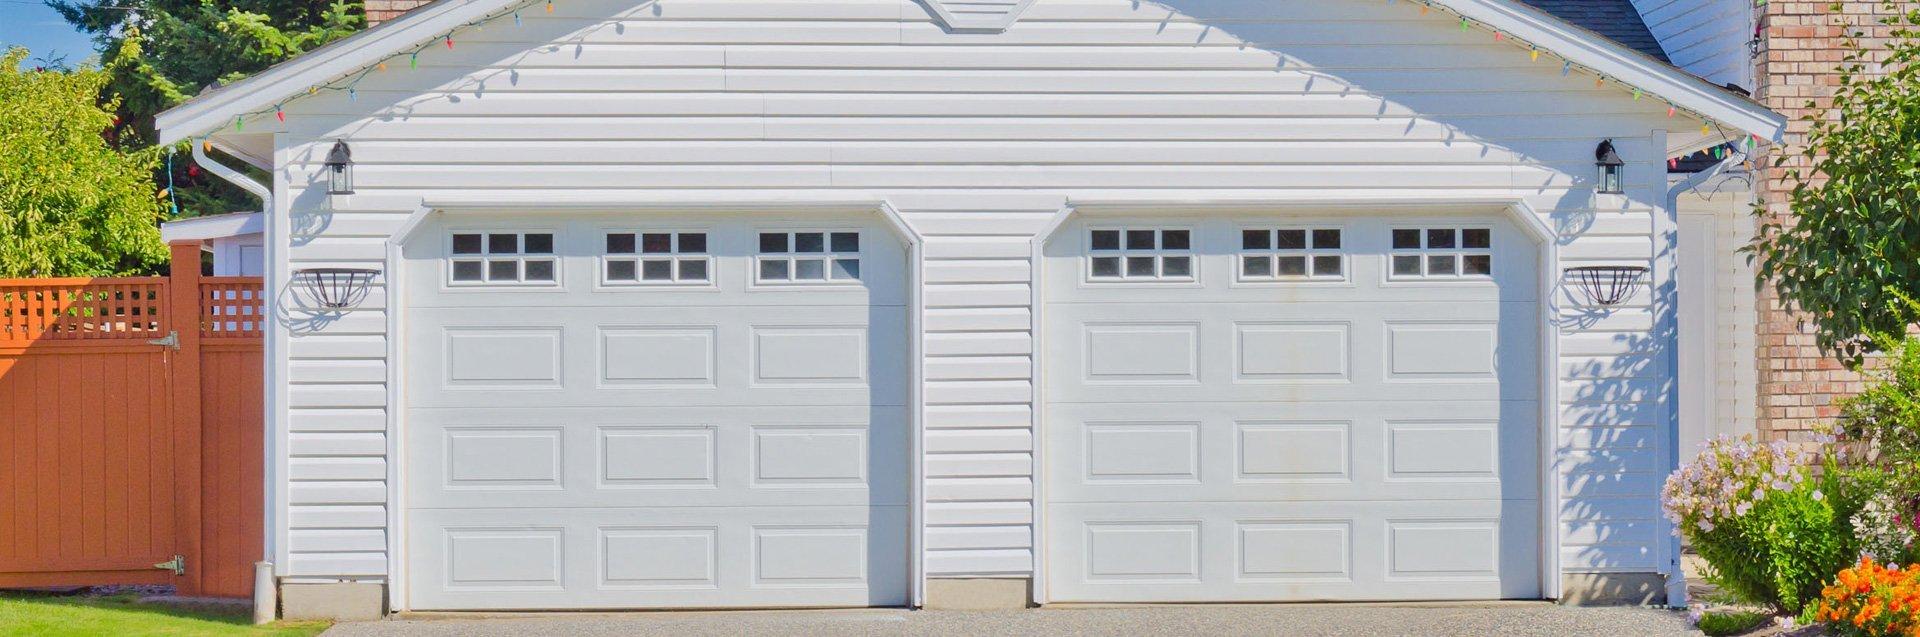 Captivating Garage Door Installation And Repair Services